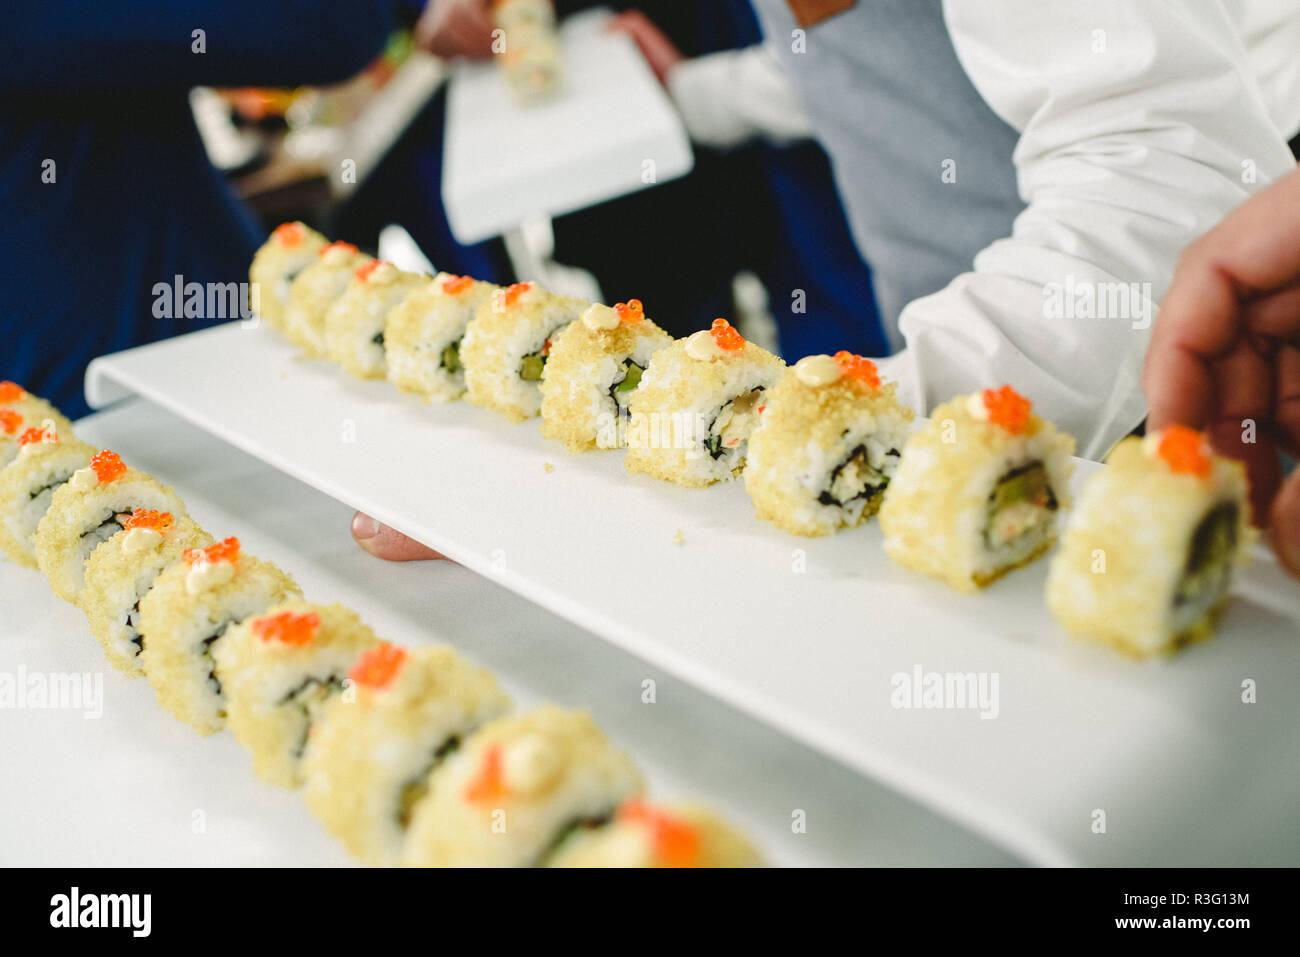 wedding food ideas appetizers Stock Photo